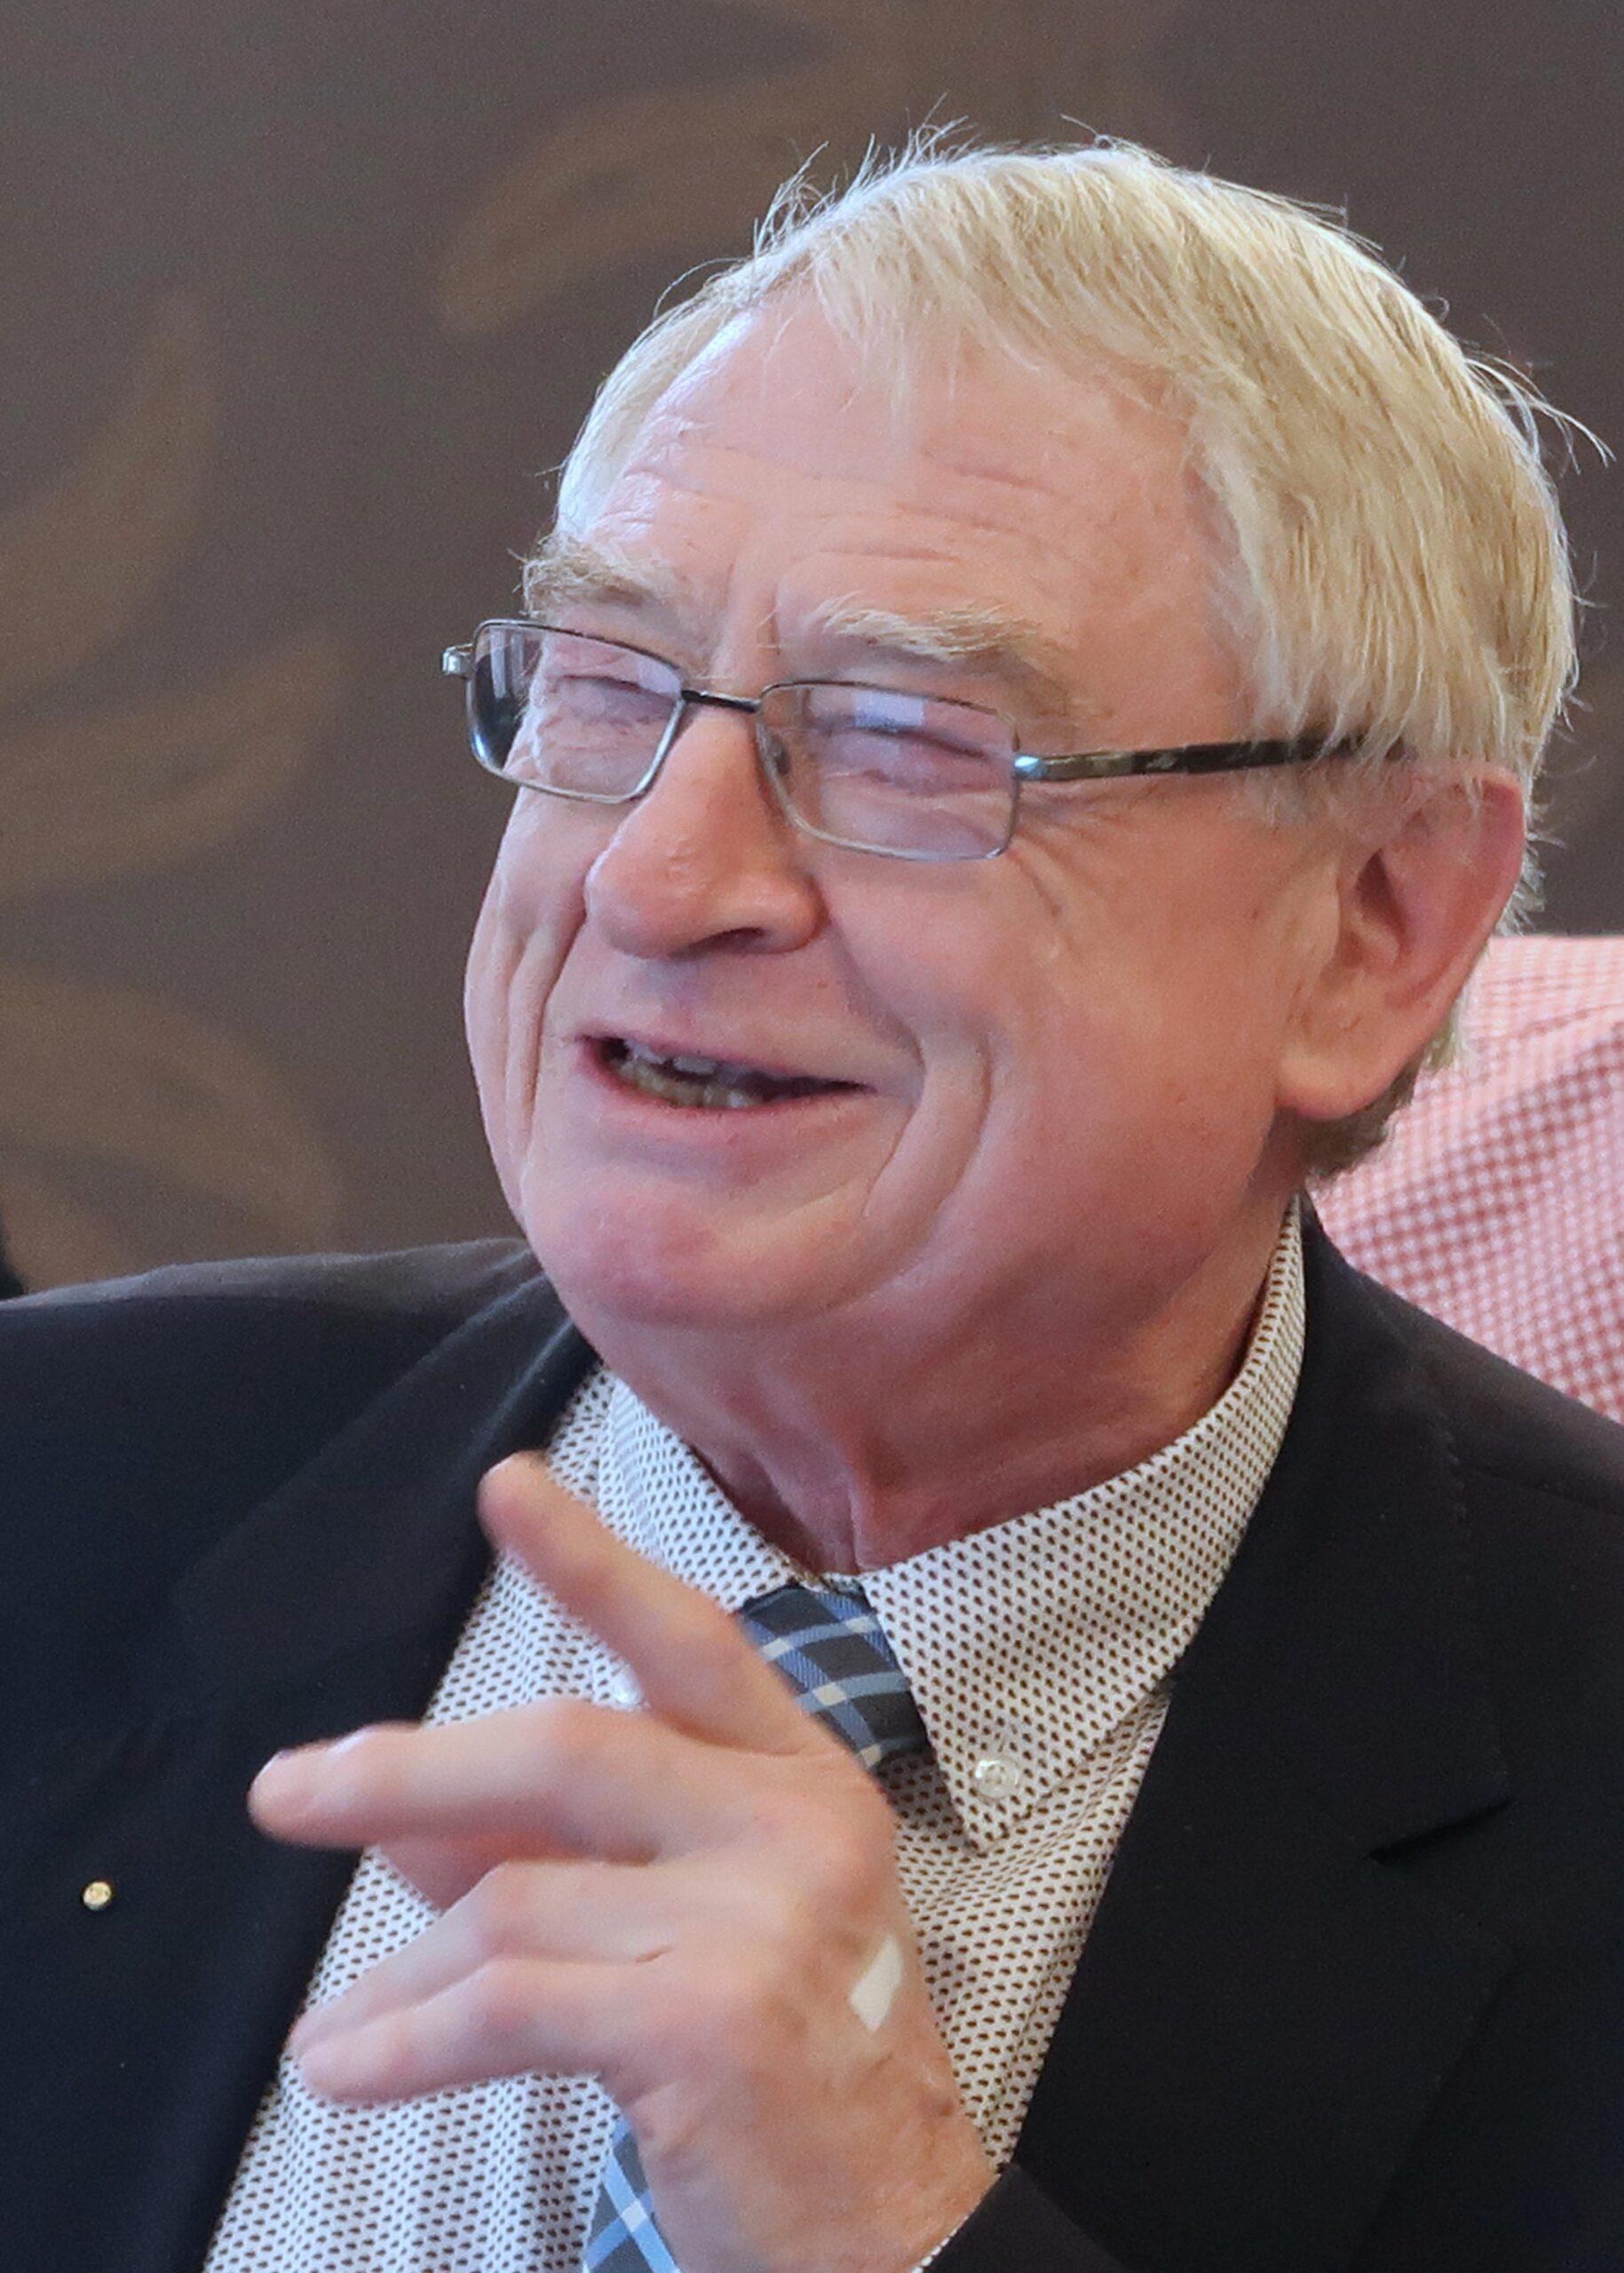 Mr. Gérard CHEUTET